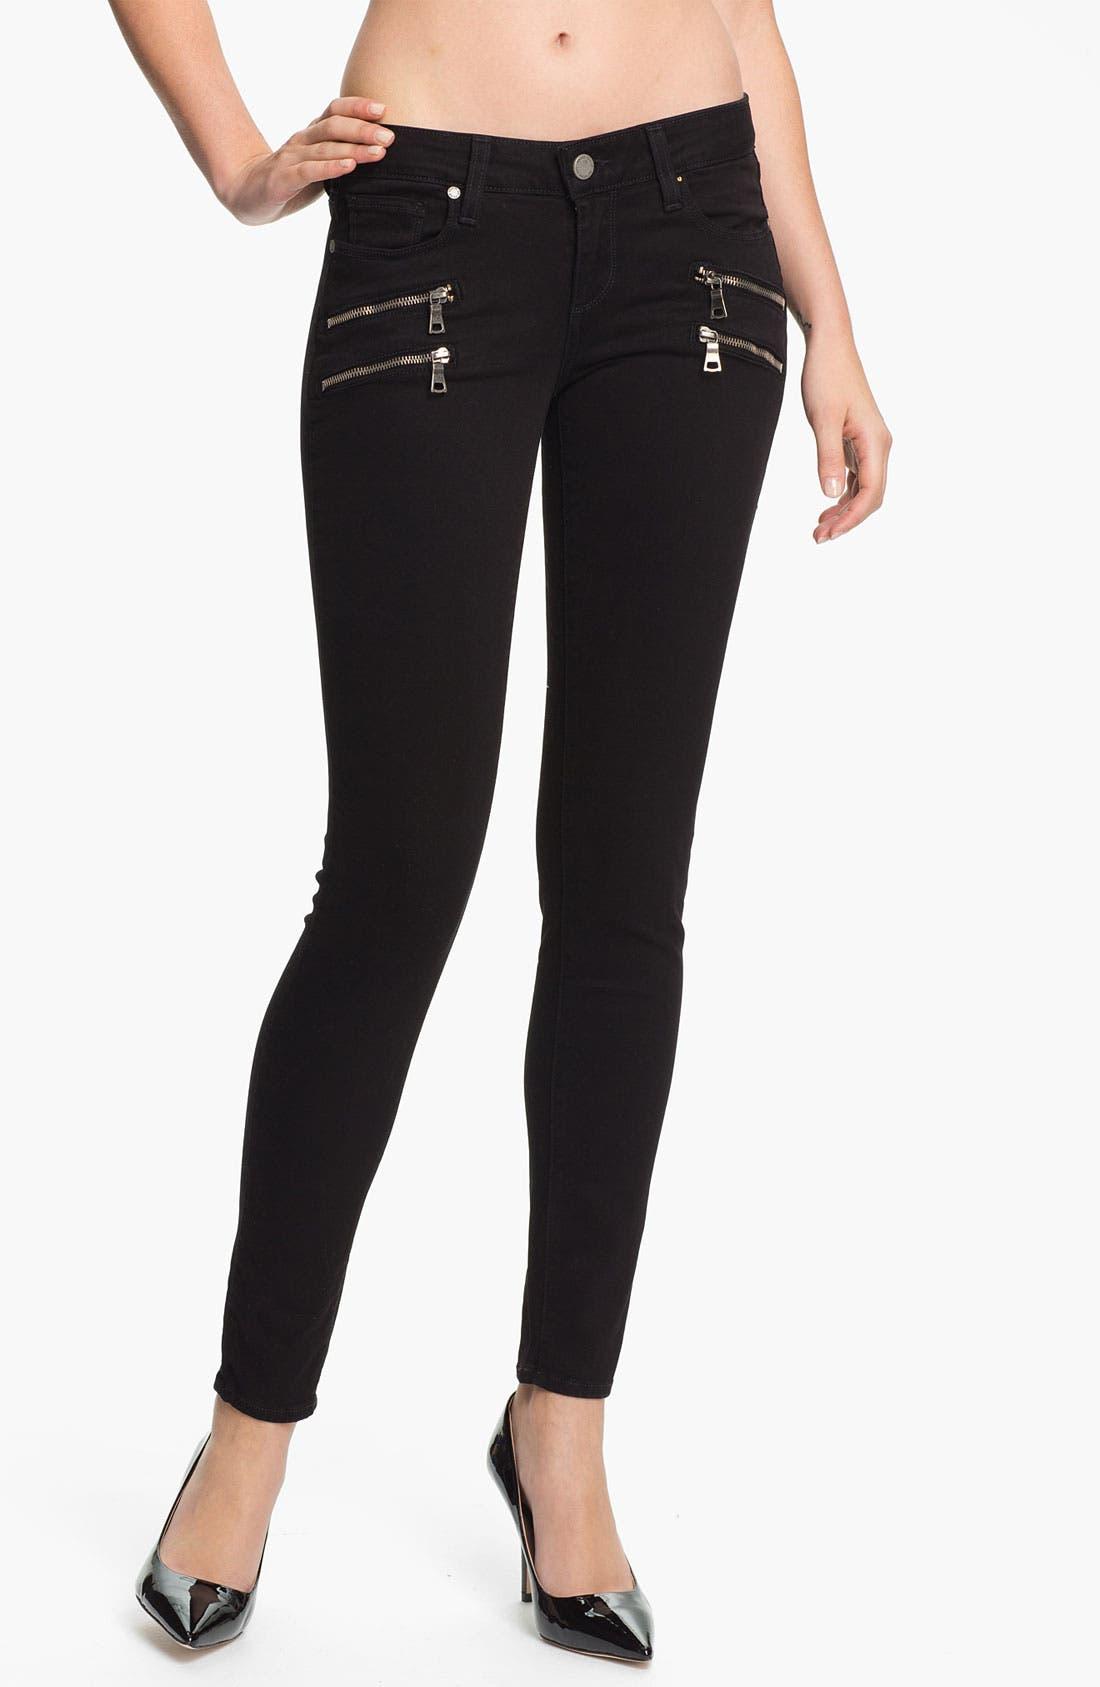 Alternate Image 1 Selected - Paige Denim 'Edgemont' Skinny Jeans (Black)